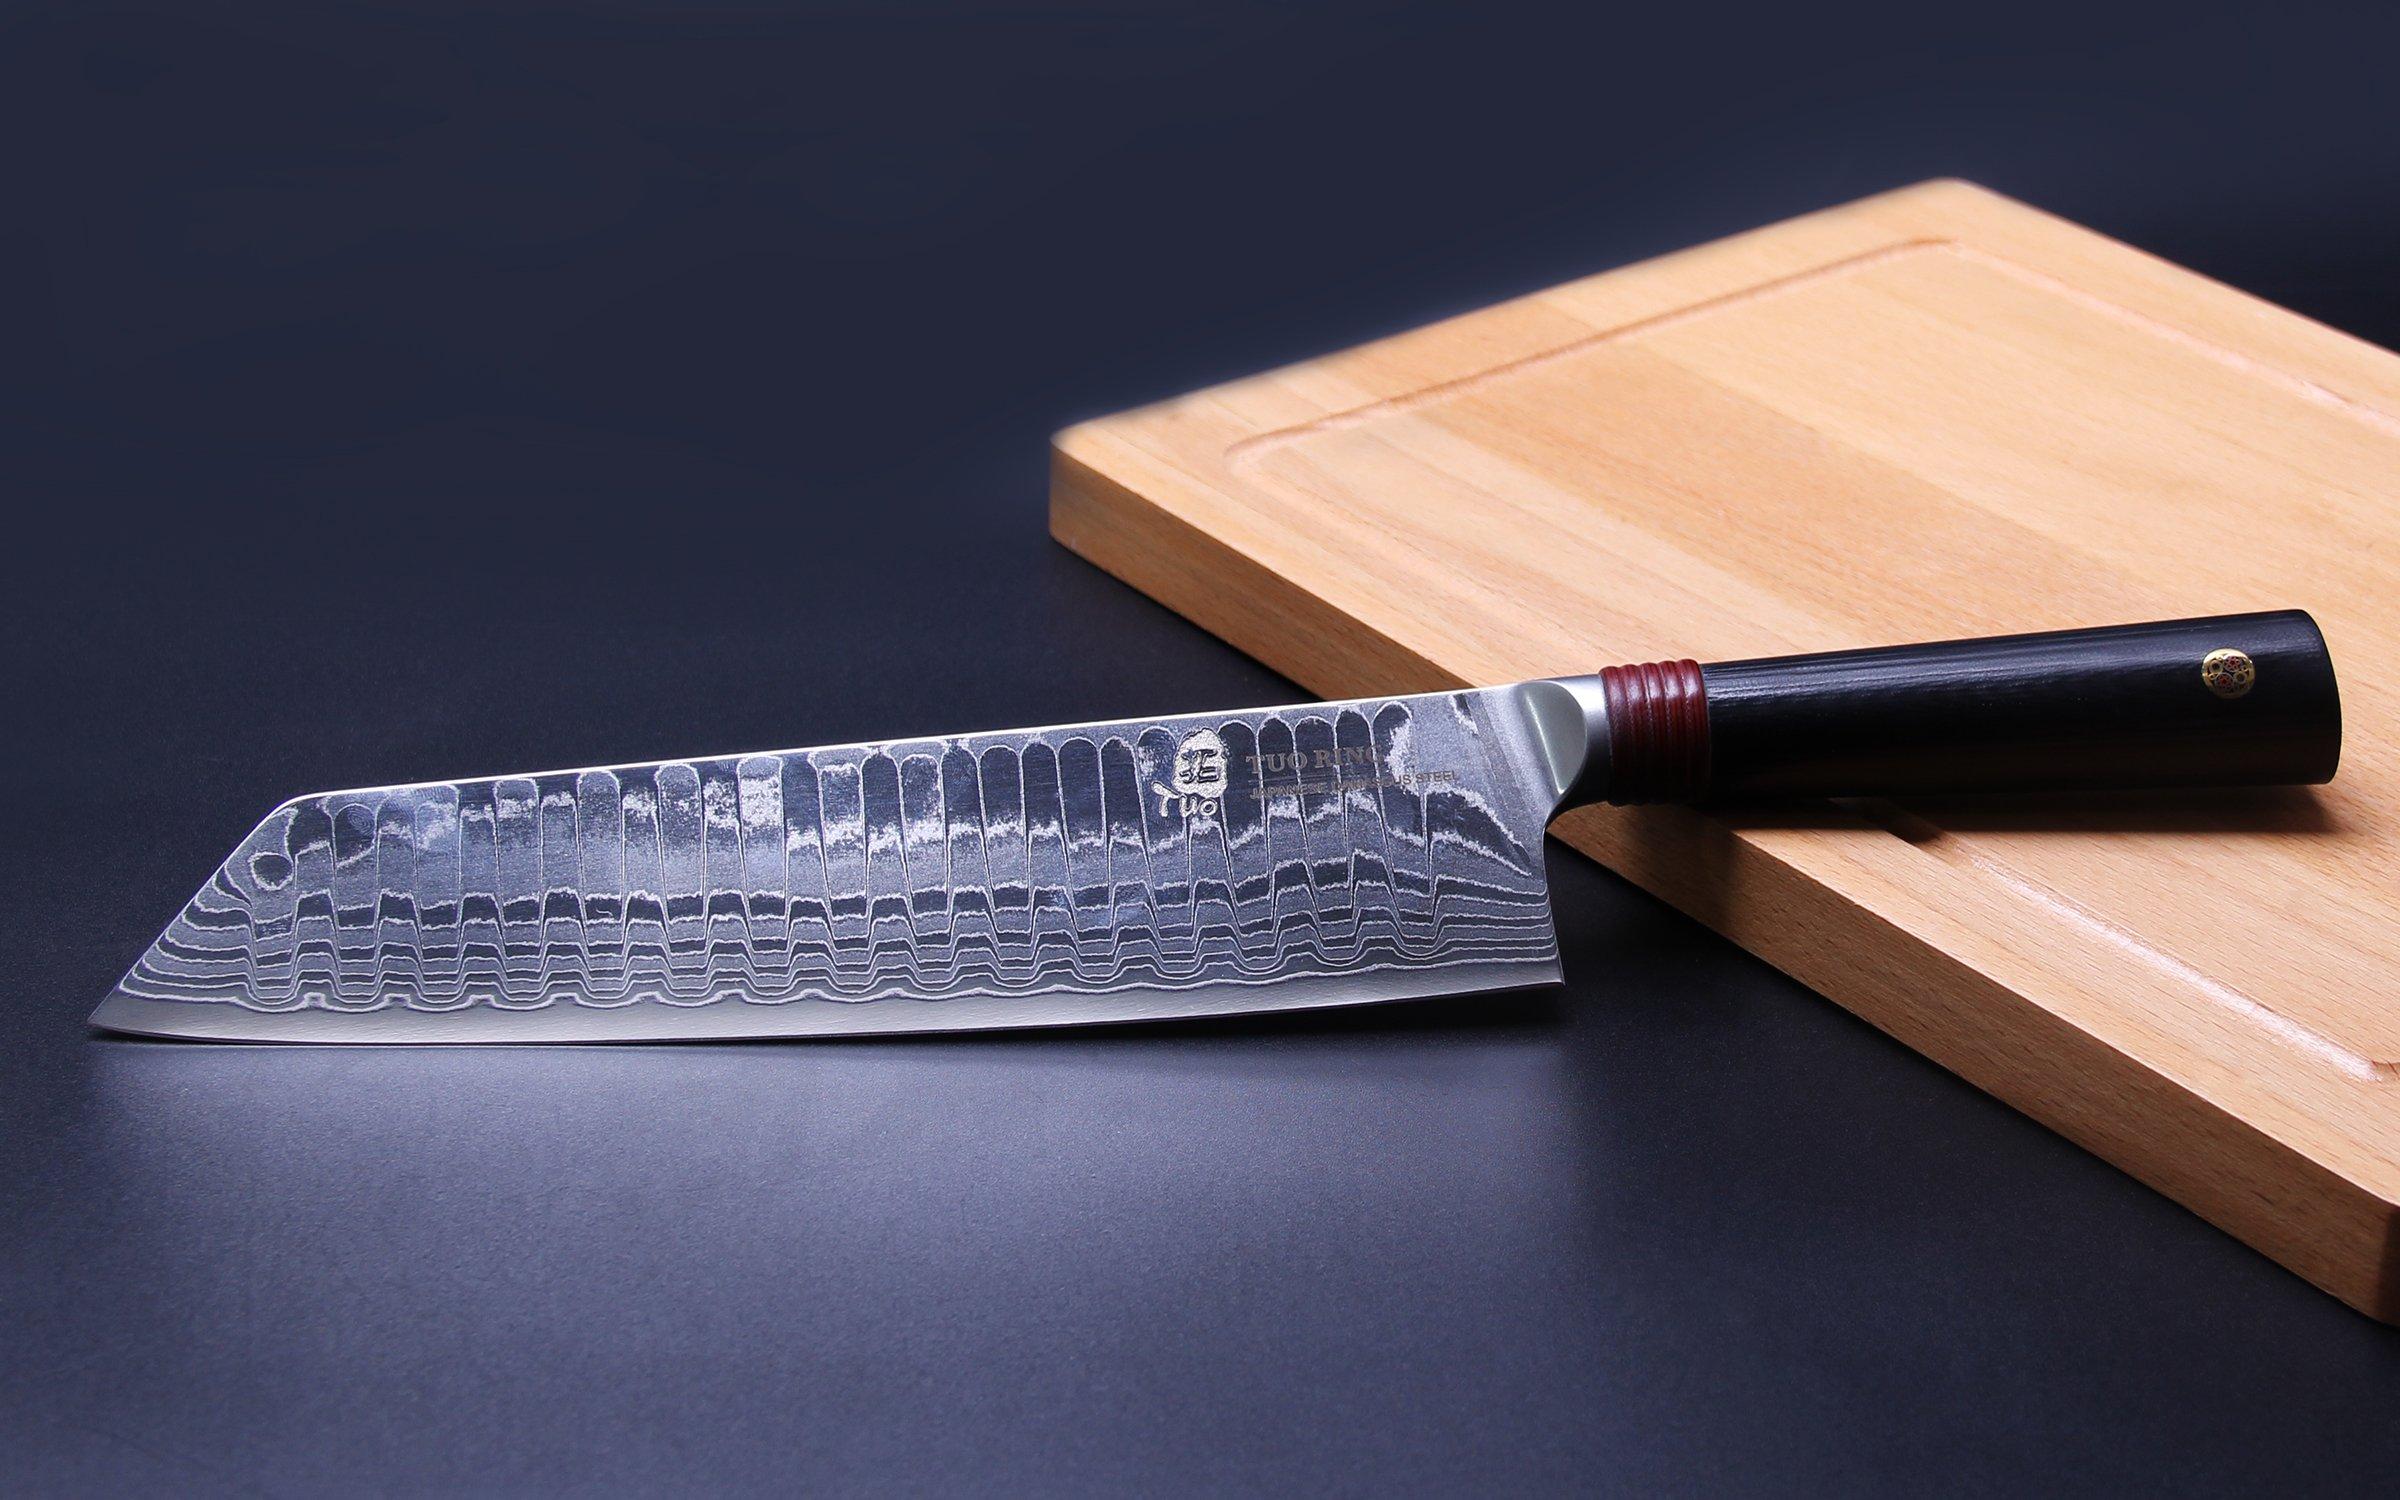 TUO Cutlery Ring D Series Japanese Damascus Kiritsuke 8.5 inch Nakiri Vegetable Kitchen Knife - Premium AUS-10 High Carbon Damascus Stainless Steel by TUO (Image #5)